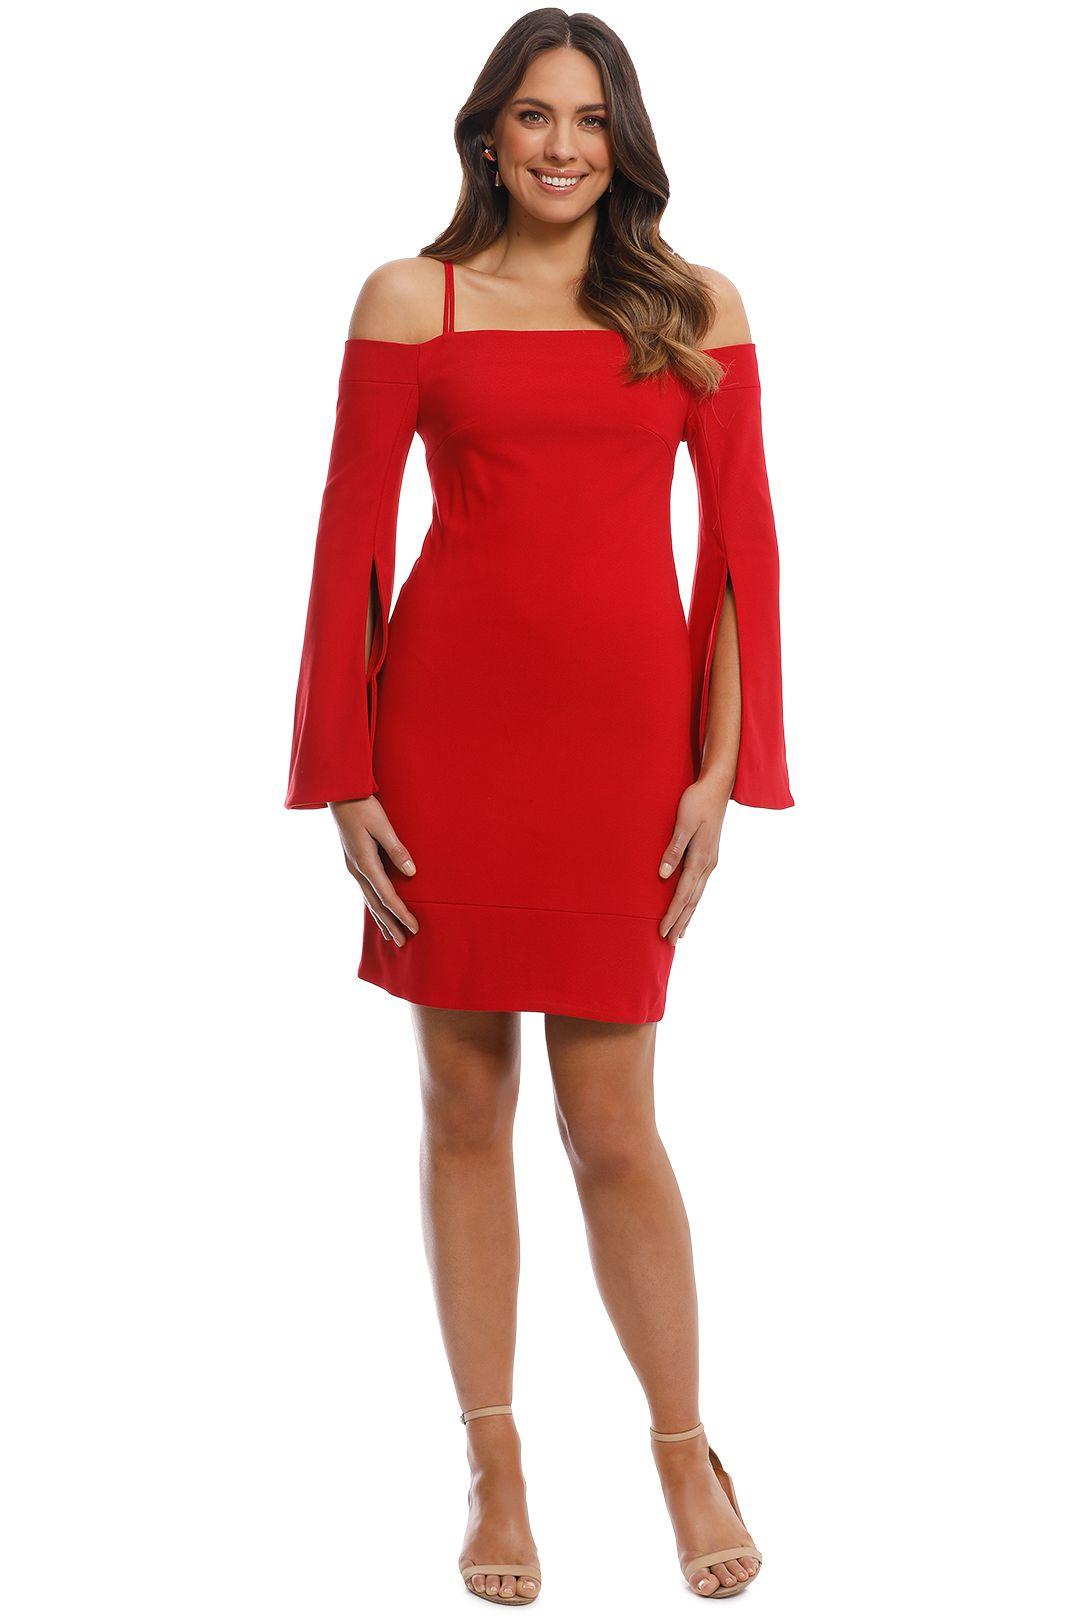 Elliatt - Tempo Dress - Red - Front